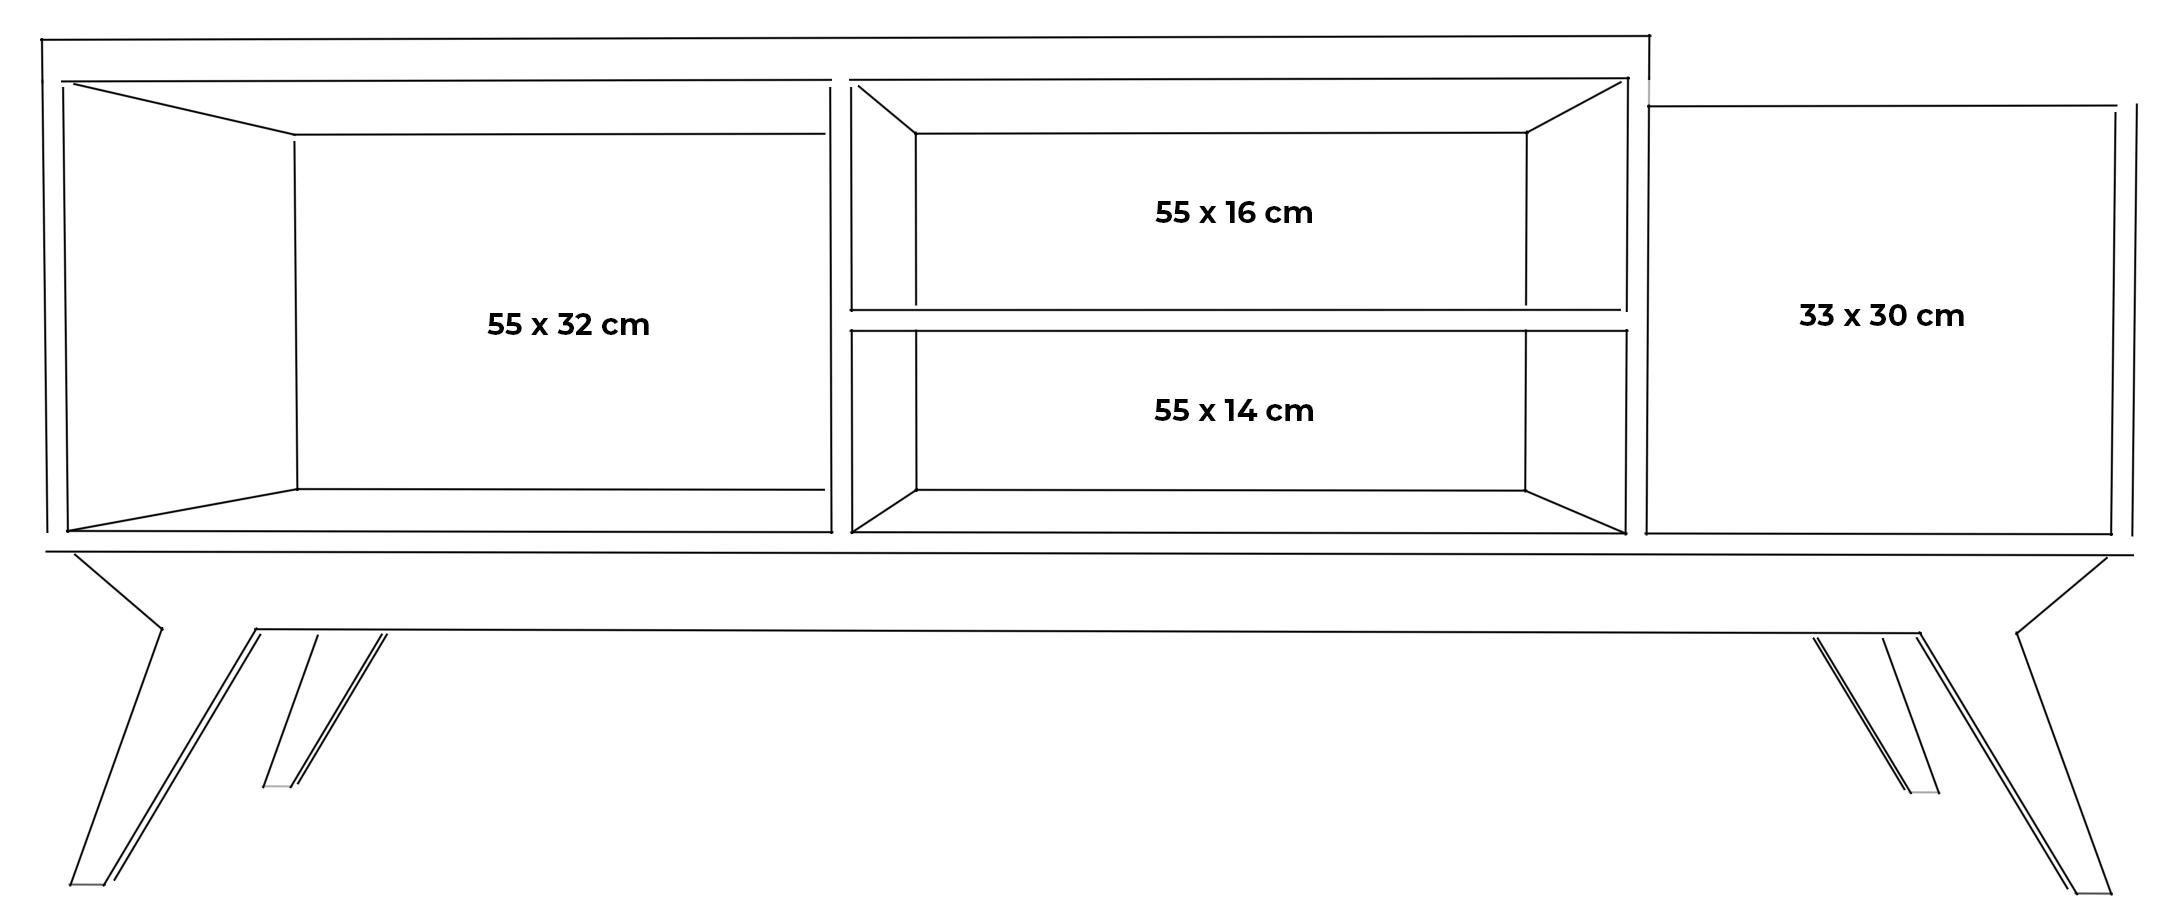 plywood tv unit vinyl stand measurements